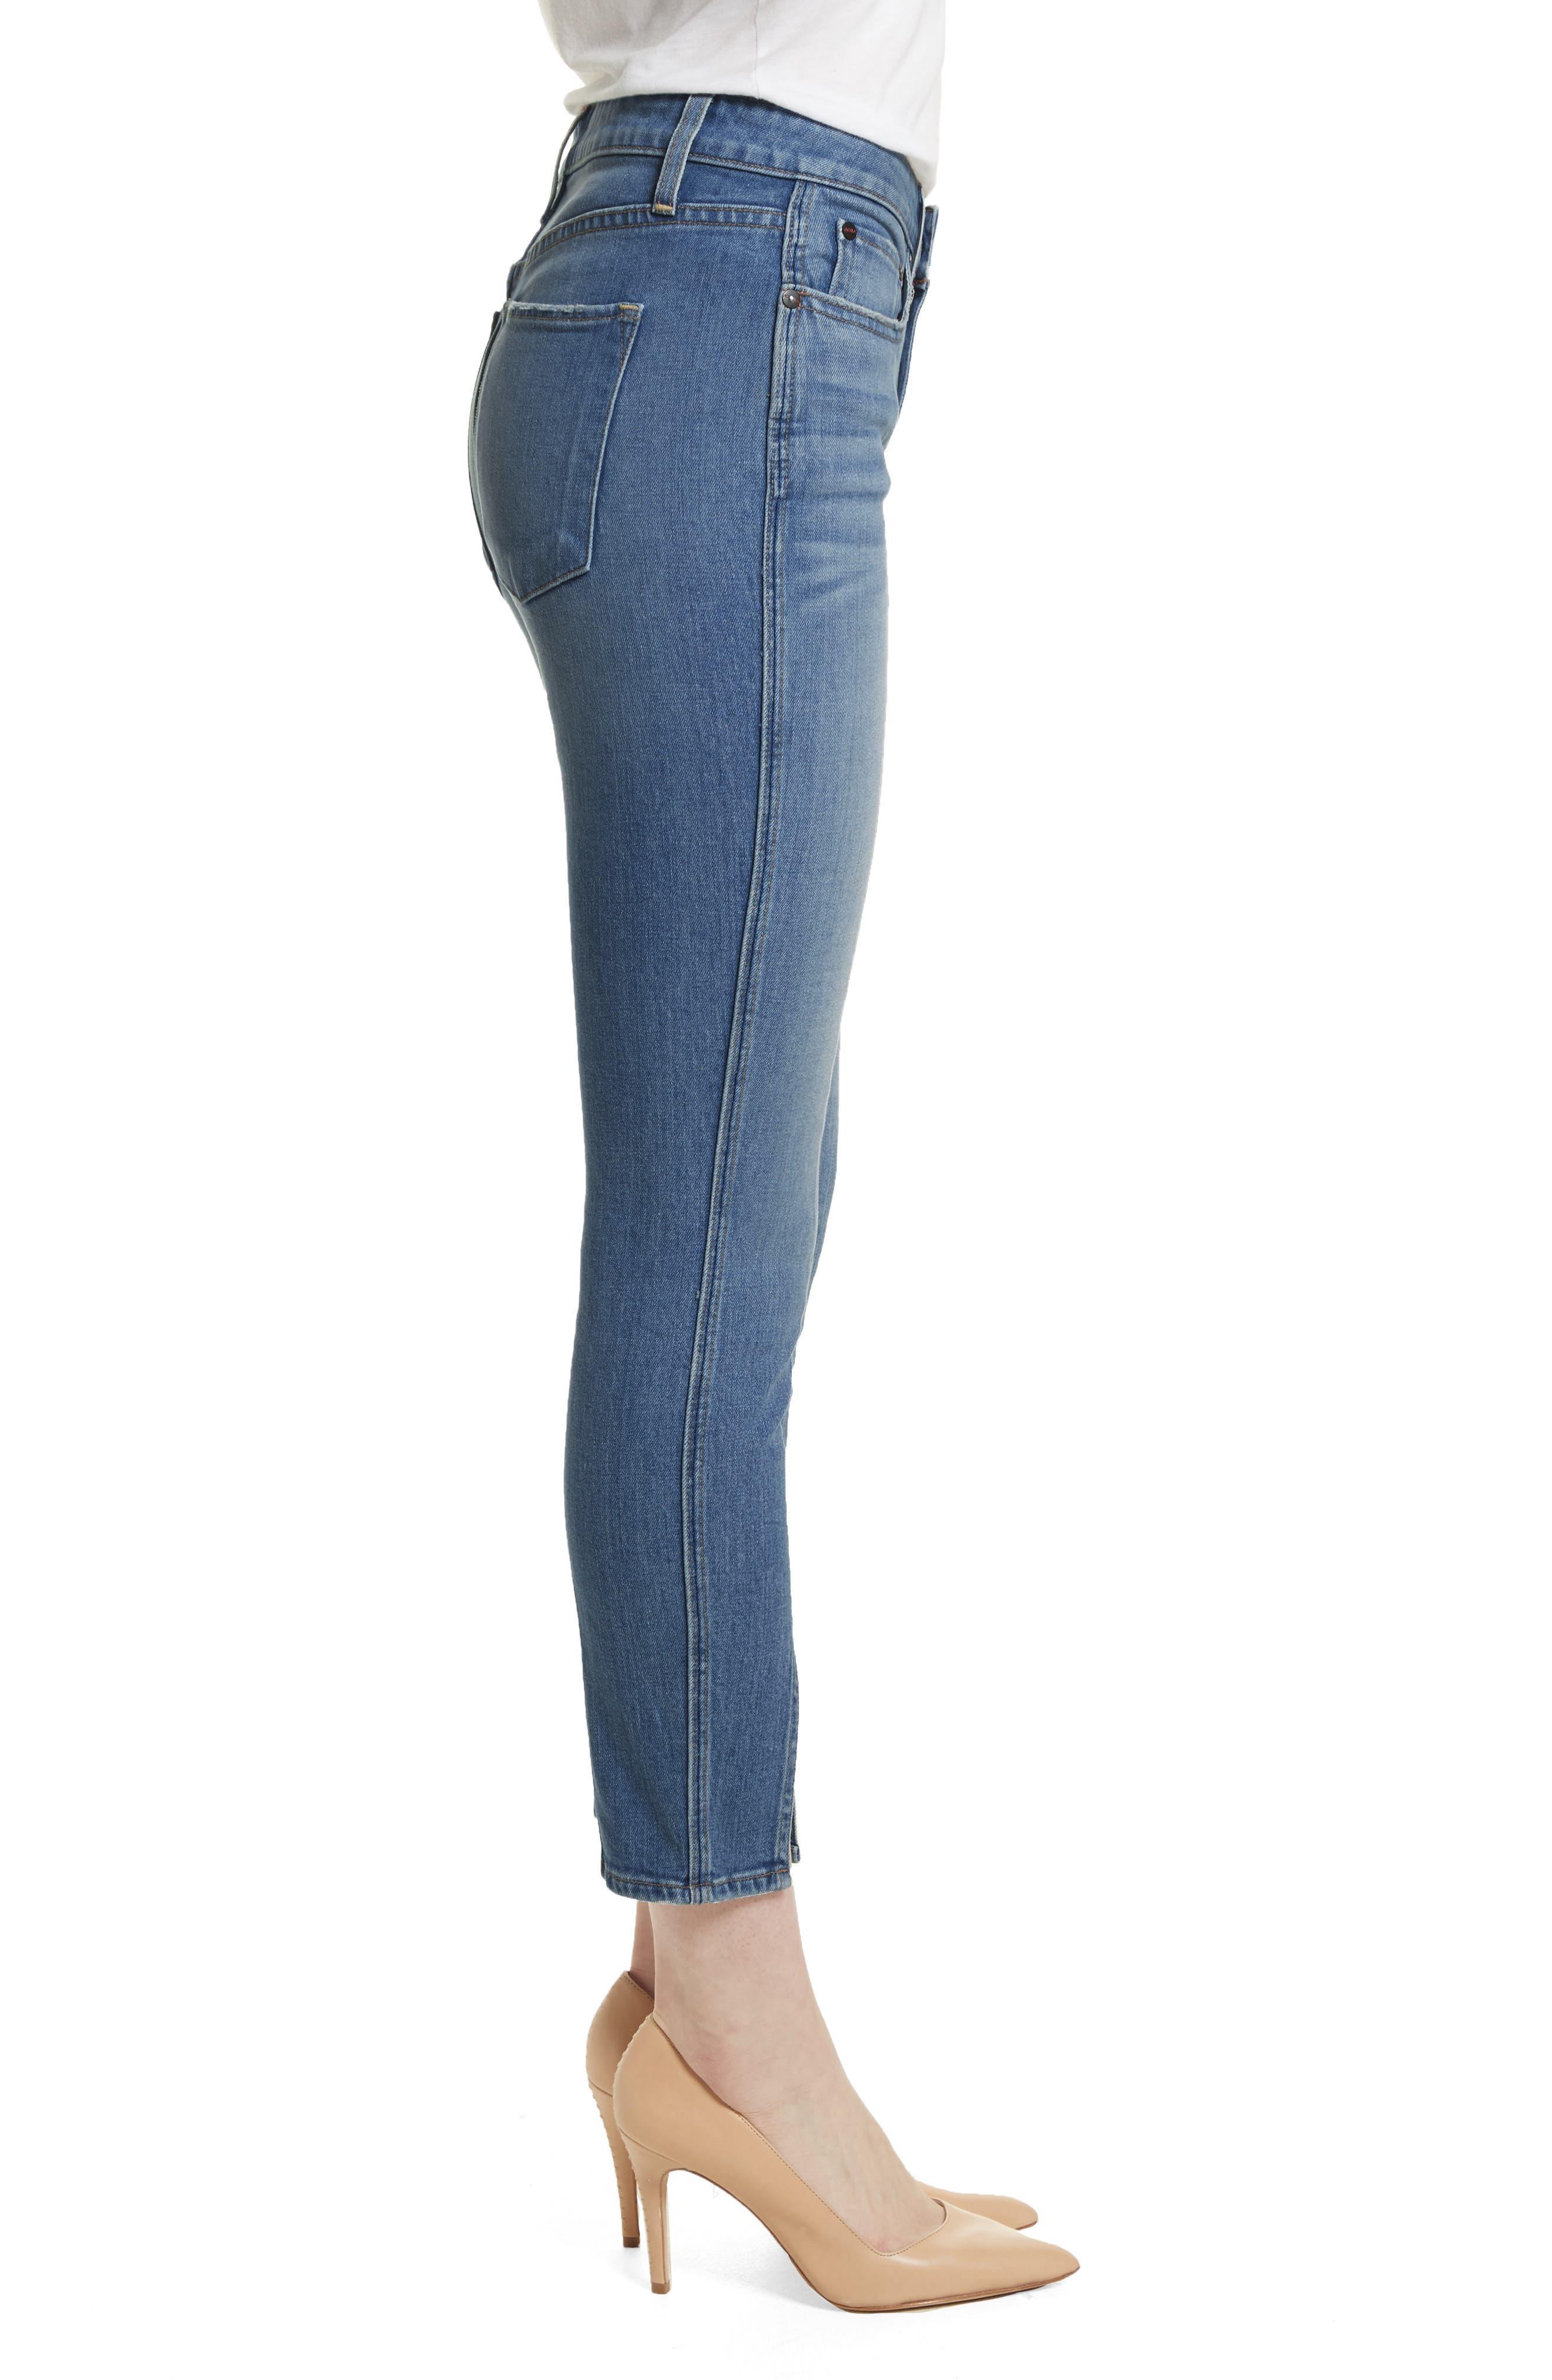 AO.LA Good Ankle Skinny Jeans,                             Alternate thumbnail 3, color,                             SWEET EMOTION